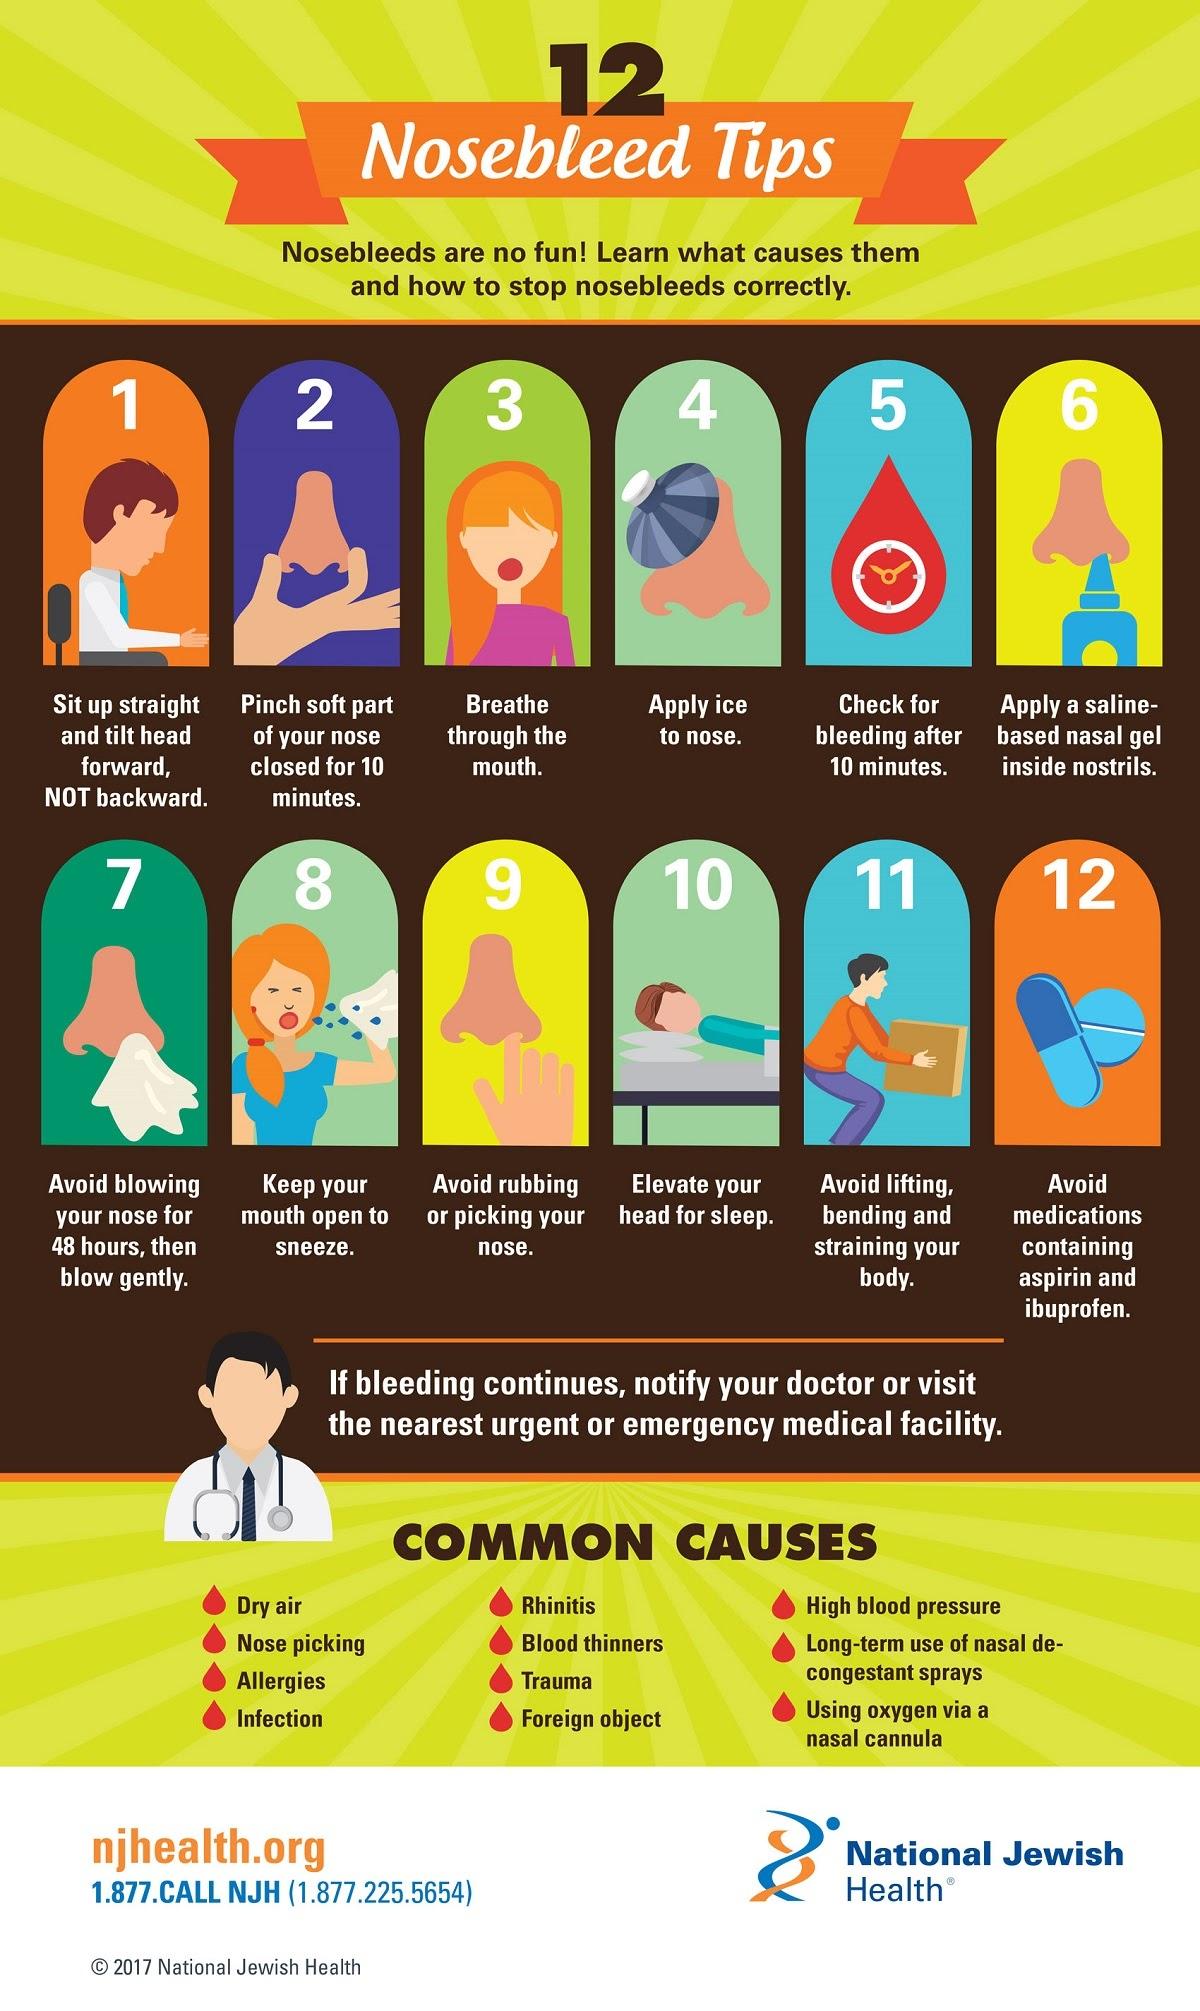 12-nosebleed-tips-infographic